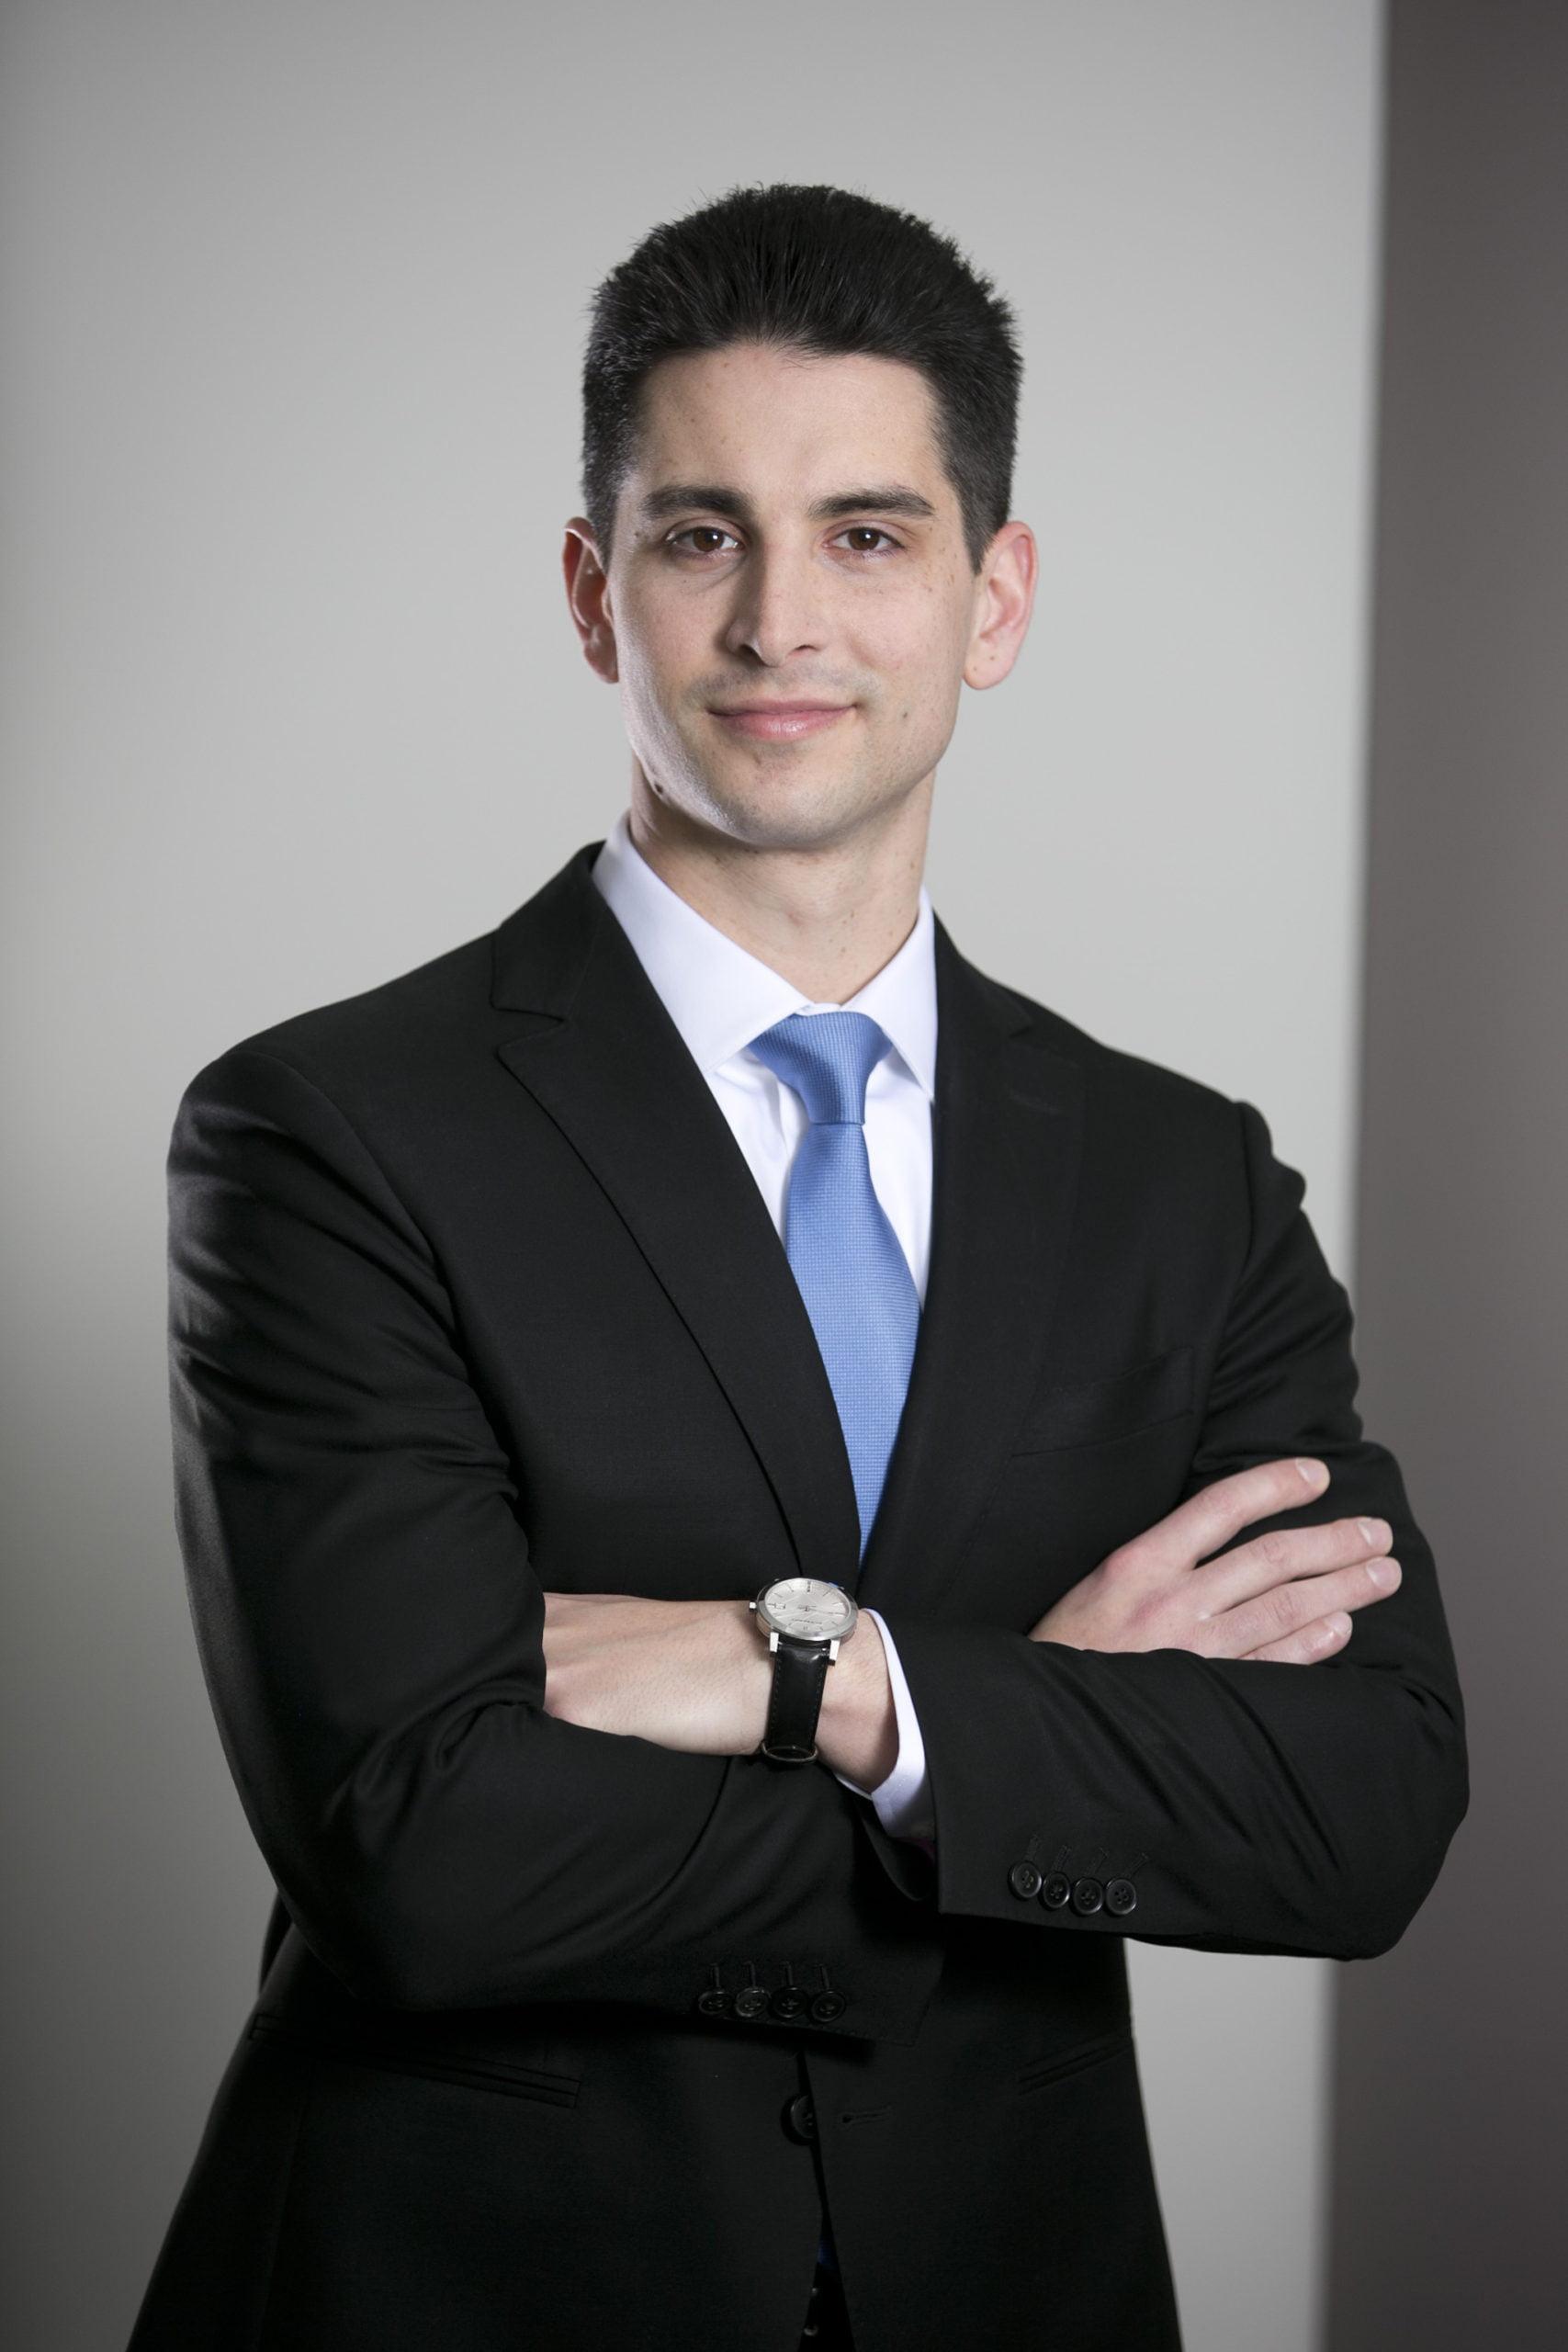 Rocco G. Motto